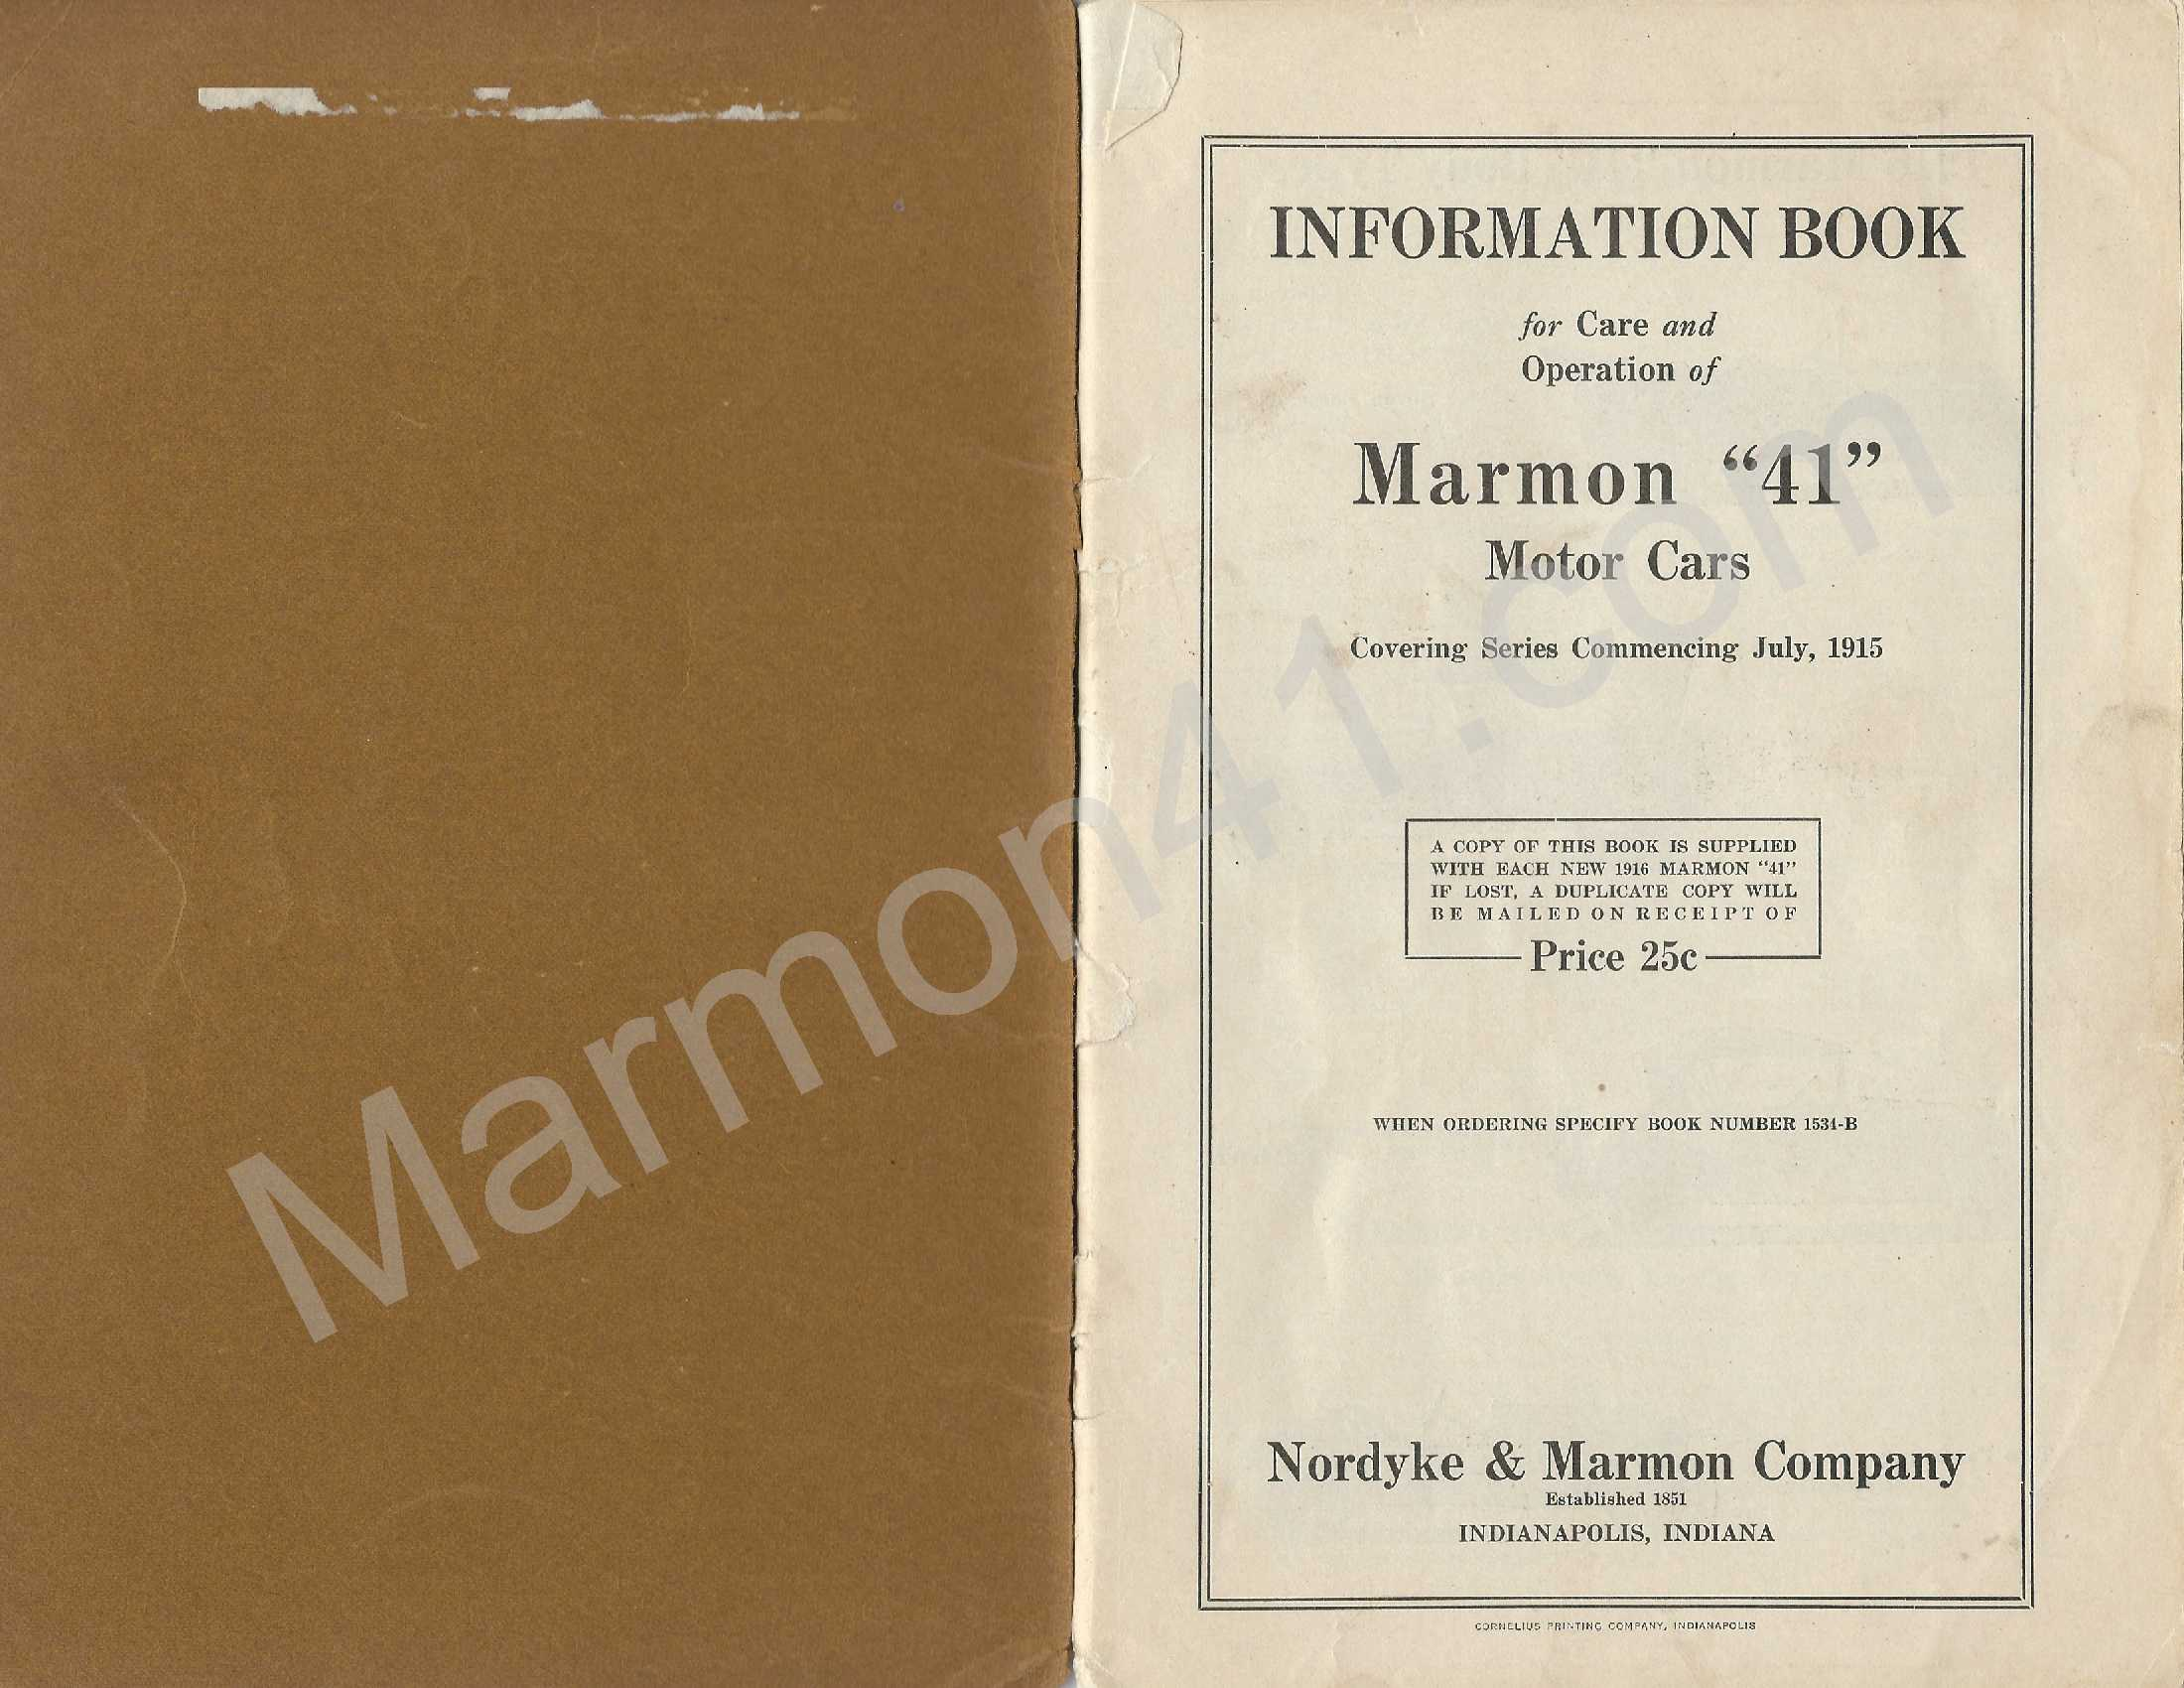 1915-07-01_Marmon41_Info_Book_1534-B_2